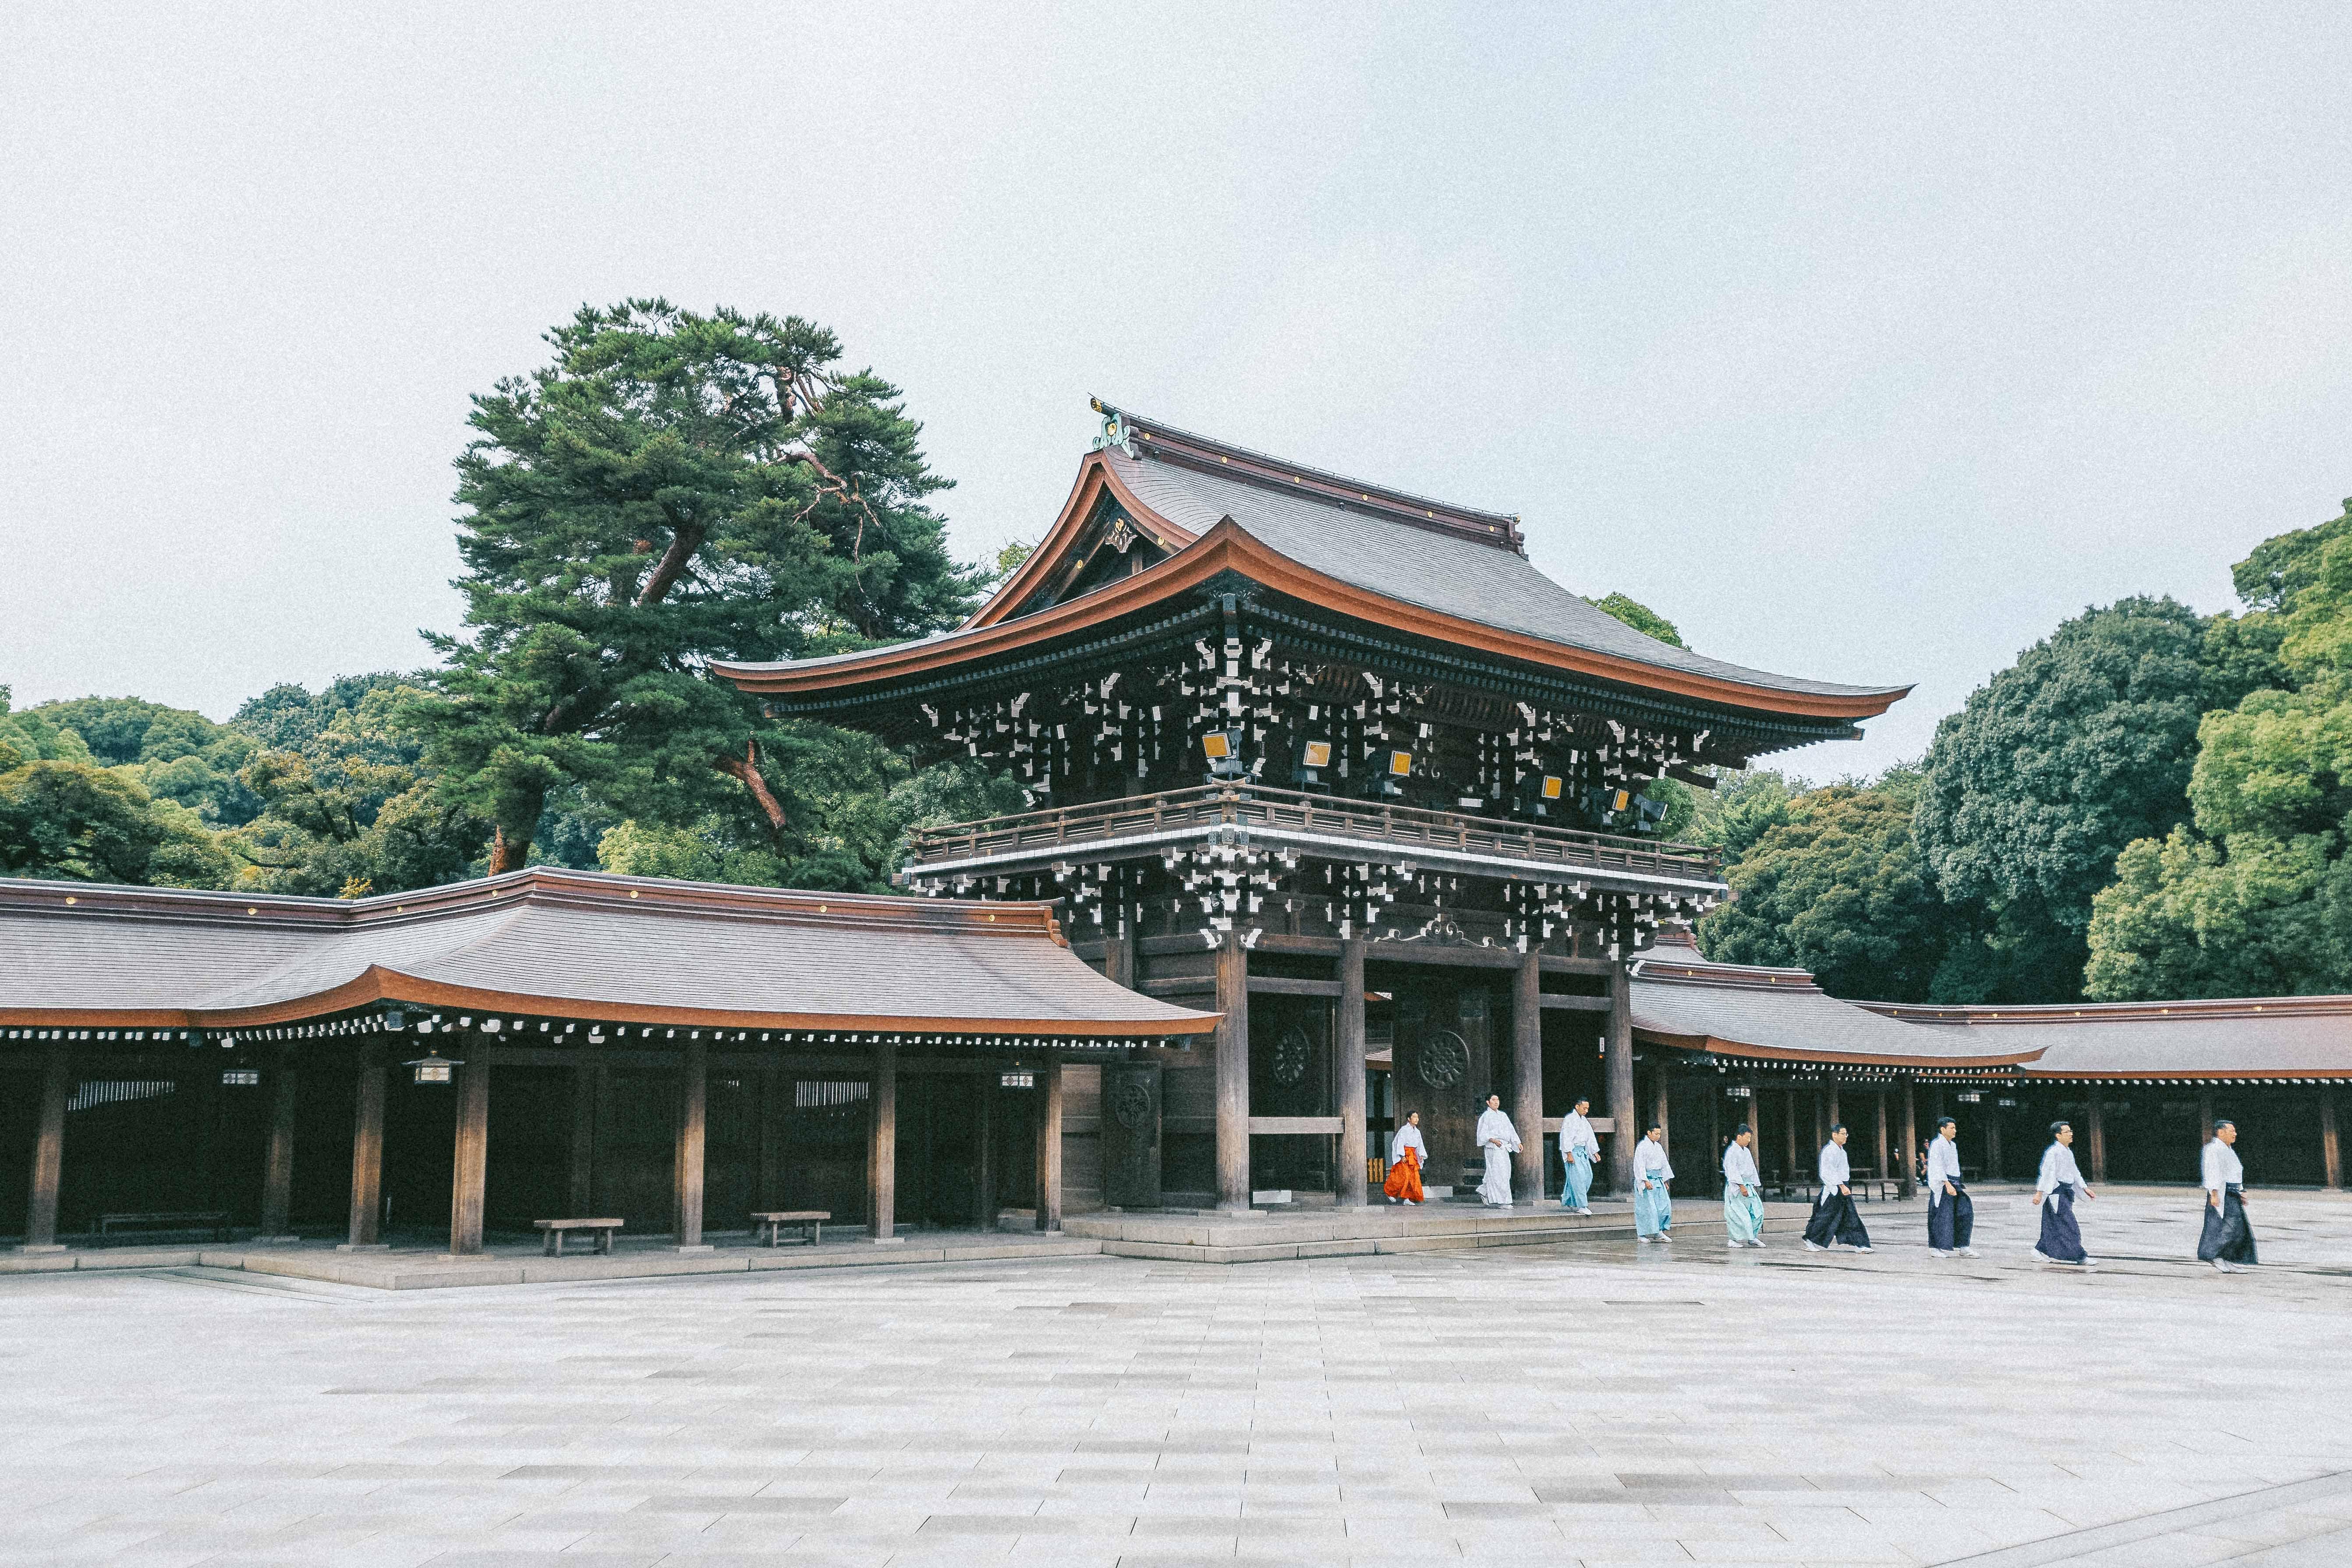 明治神宮(神宮の杜芸術祝祭)